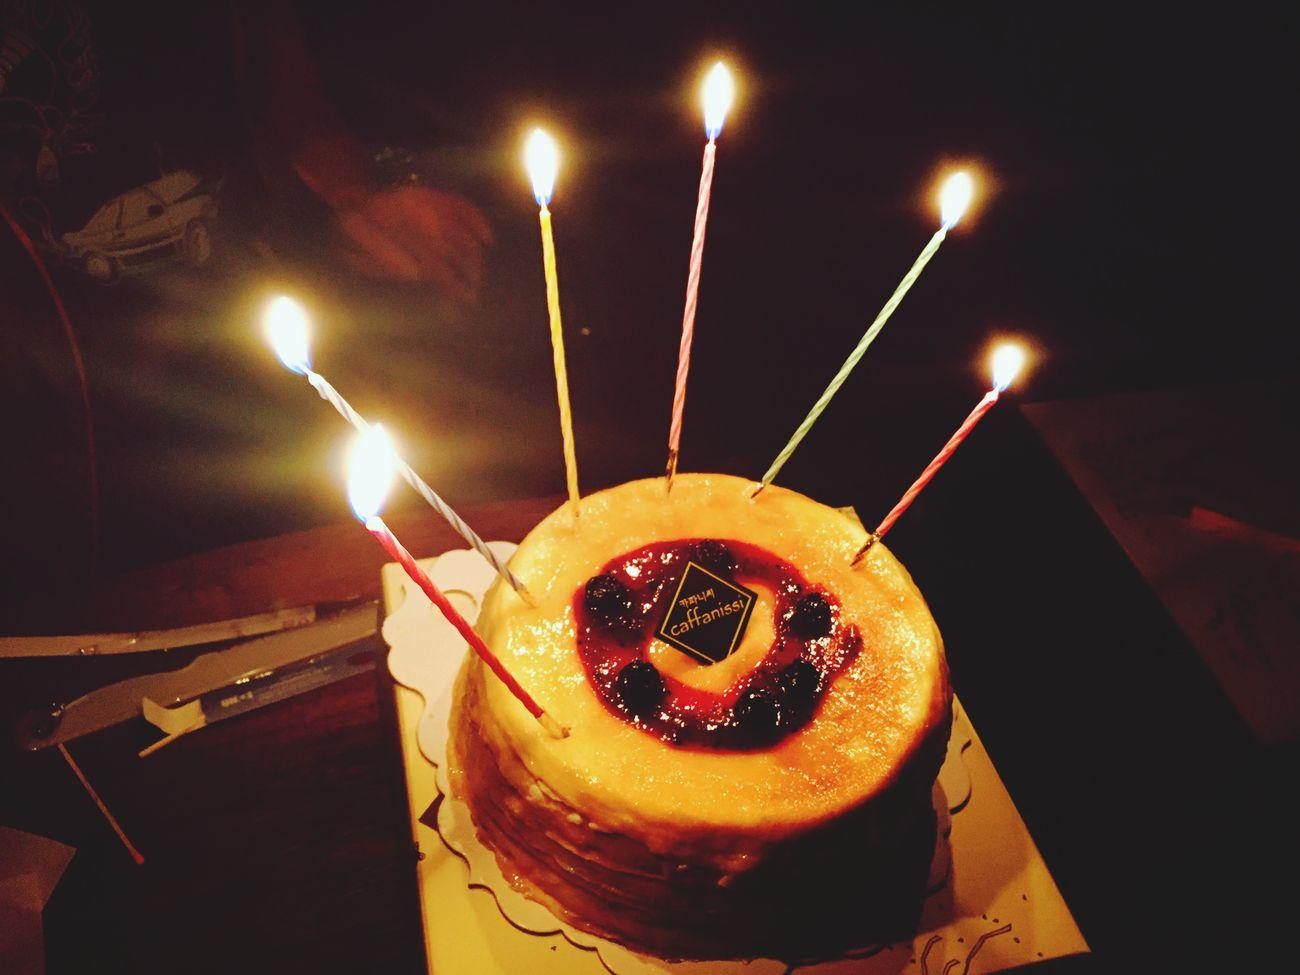 Mom's Birthday Congratulations Crape Cake Yummy♡ Home Sweet Home ❤️❤️